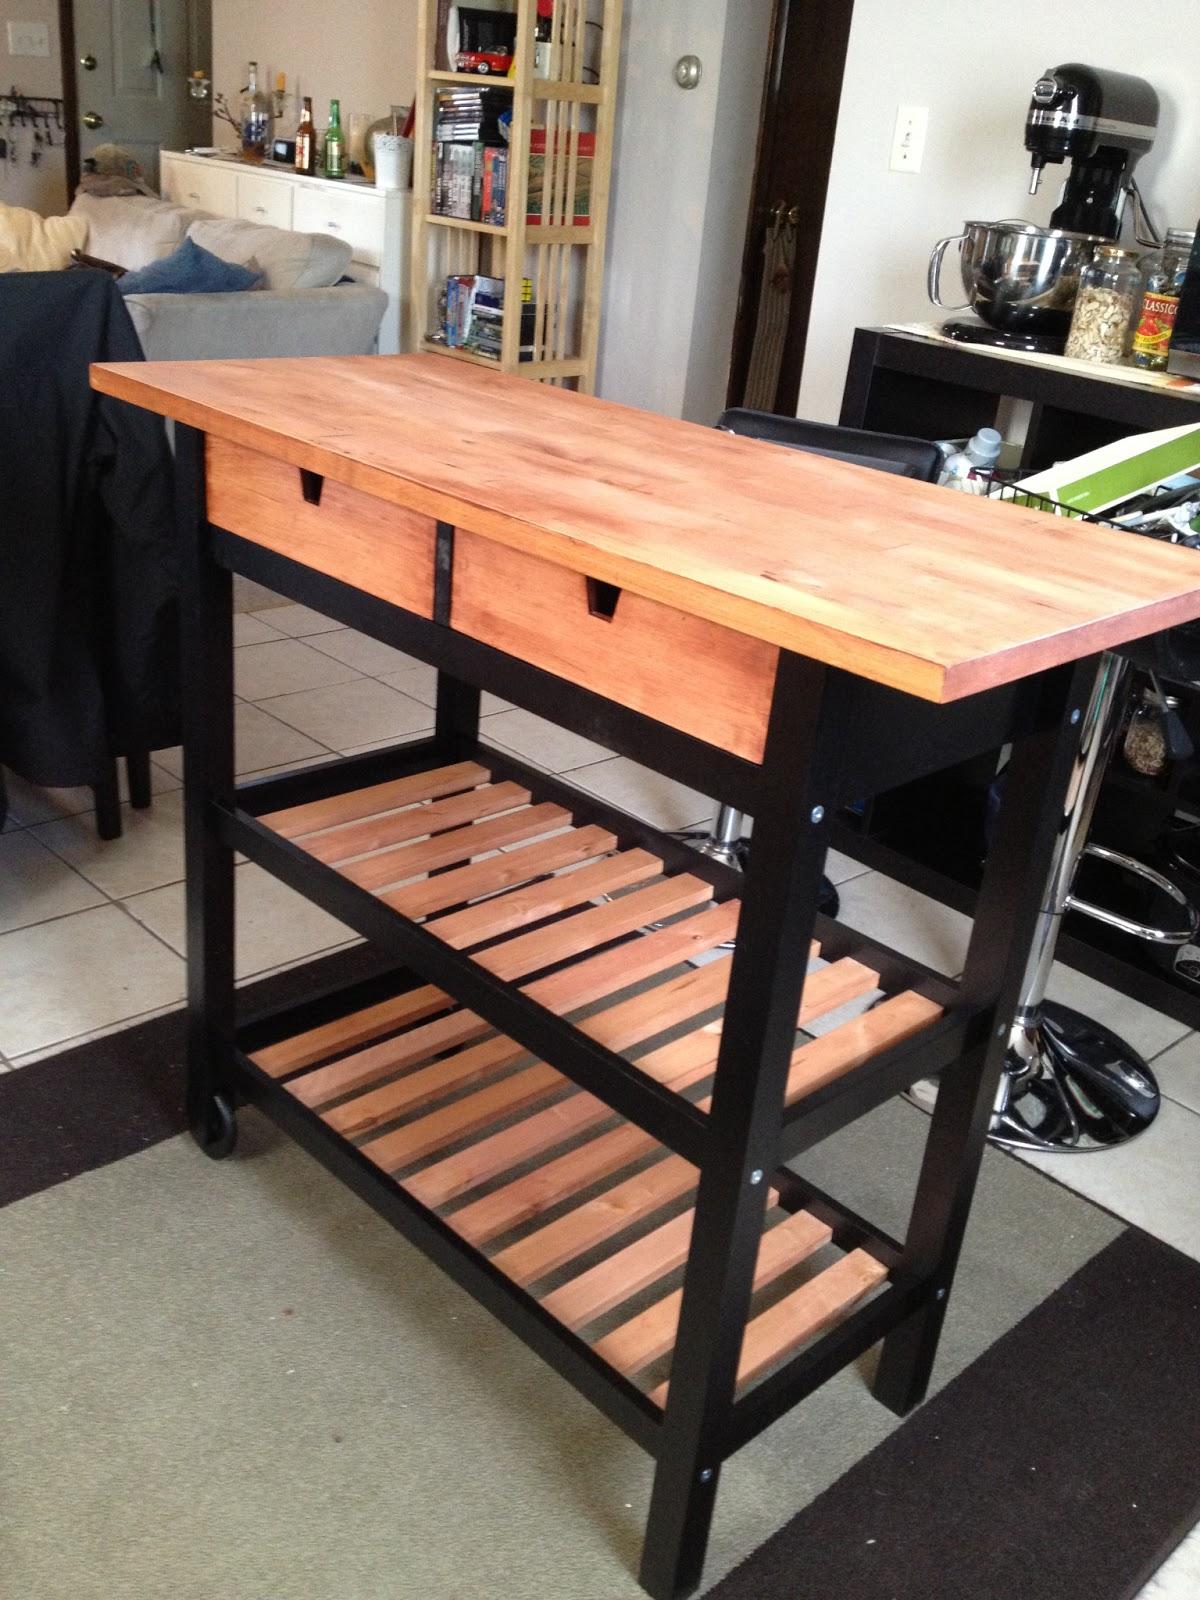 Ikea kitchen cart painted - F Rh Ja Redone